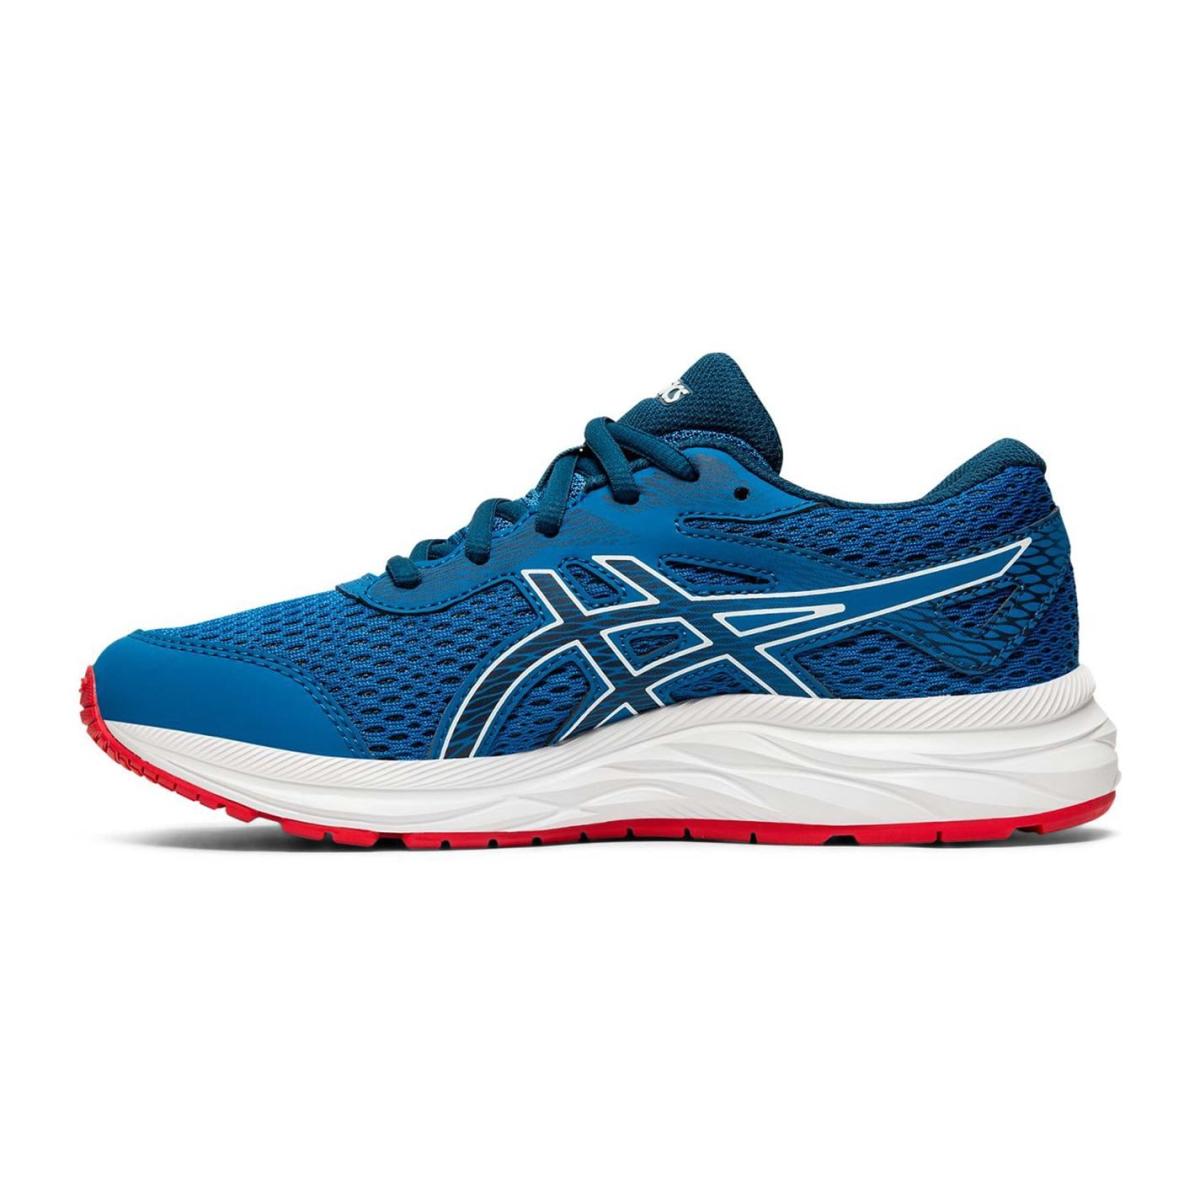 Asics-Gel-Excite-6-Turnschuhe-Laufschuhe-Jungen-Kinder-Sneaker-Sportschuhe-7026 Indexbild 7